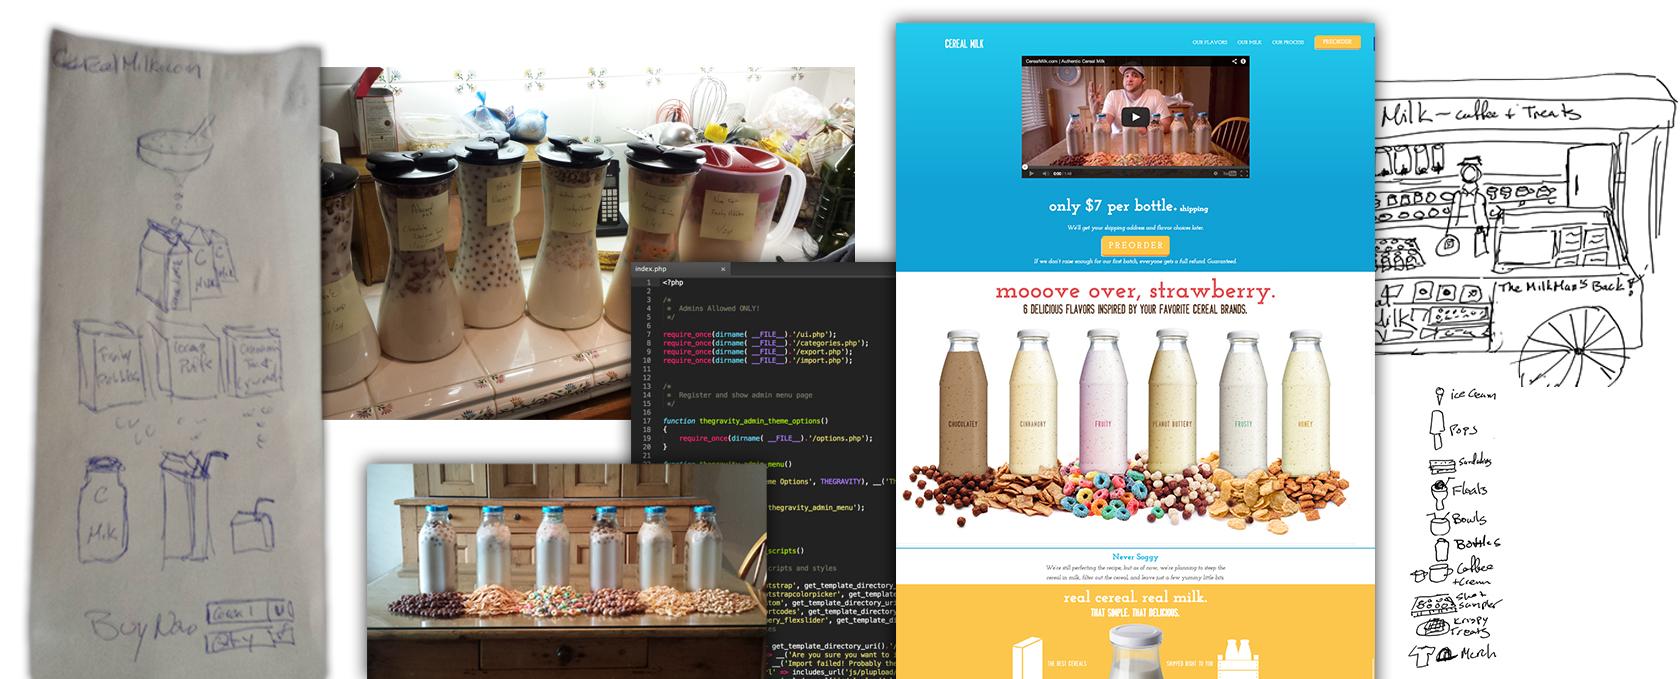 Cereal Milk Assembly Line Jam Studios